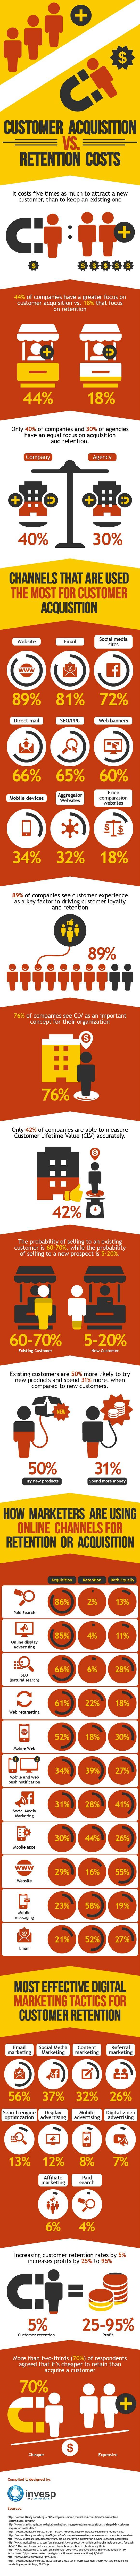 Customer Acquisition v Retention Costs